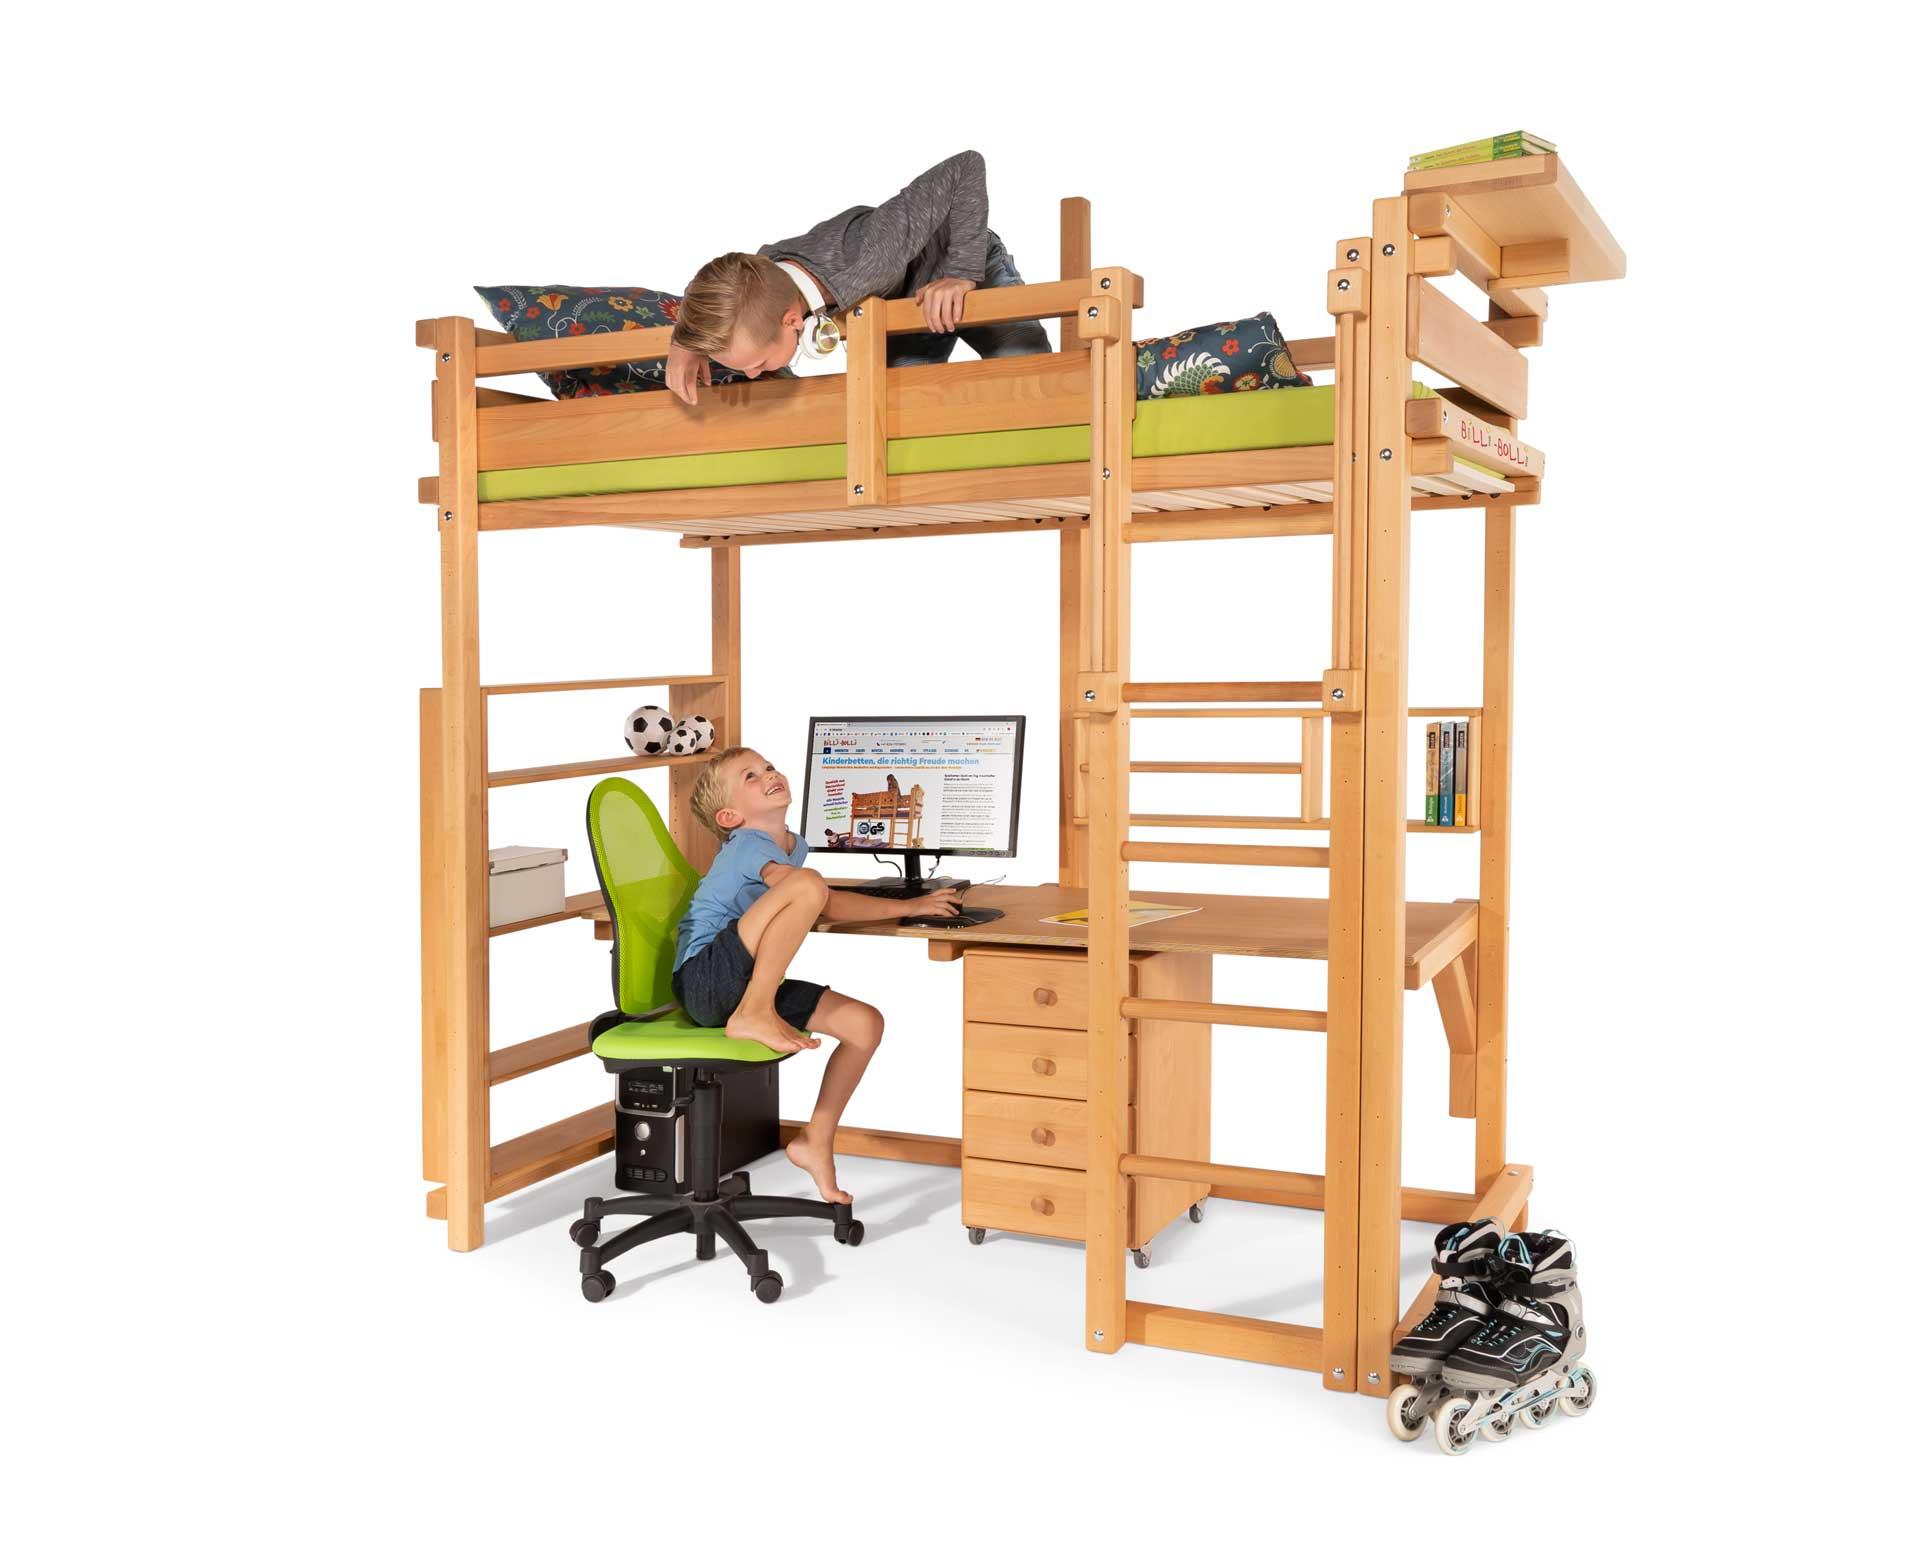 Full Size of Coole Kinderbetten T Shirt Sprüche Betten T Shirt Wohnzimmer Coole Kinderbetten